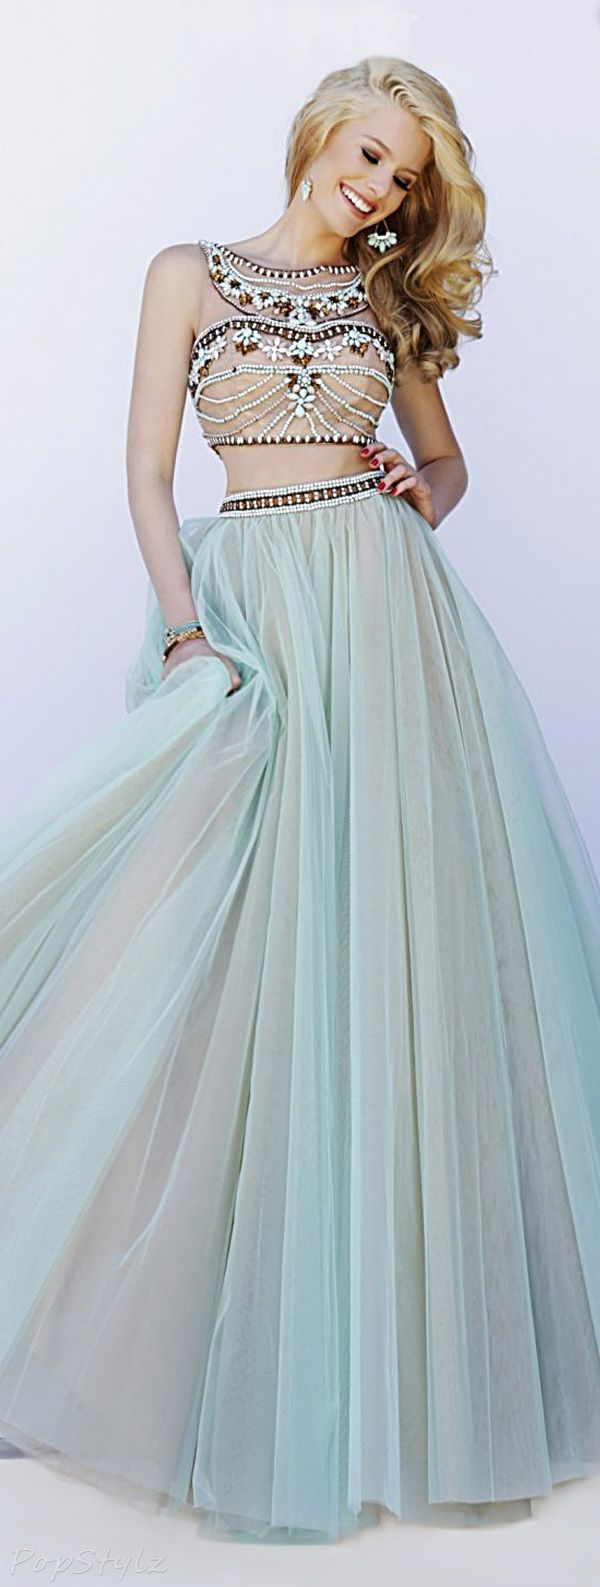 Sherri Hill 11271 Lovely Long Flowing Mint Evening Gown | posh ...